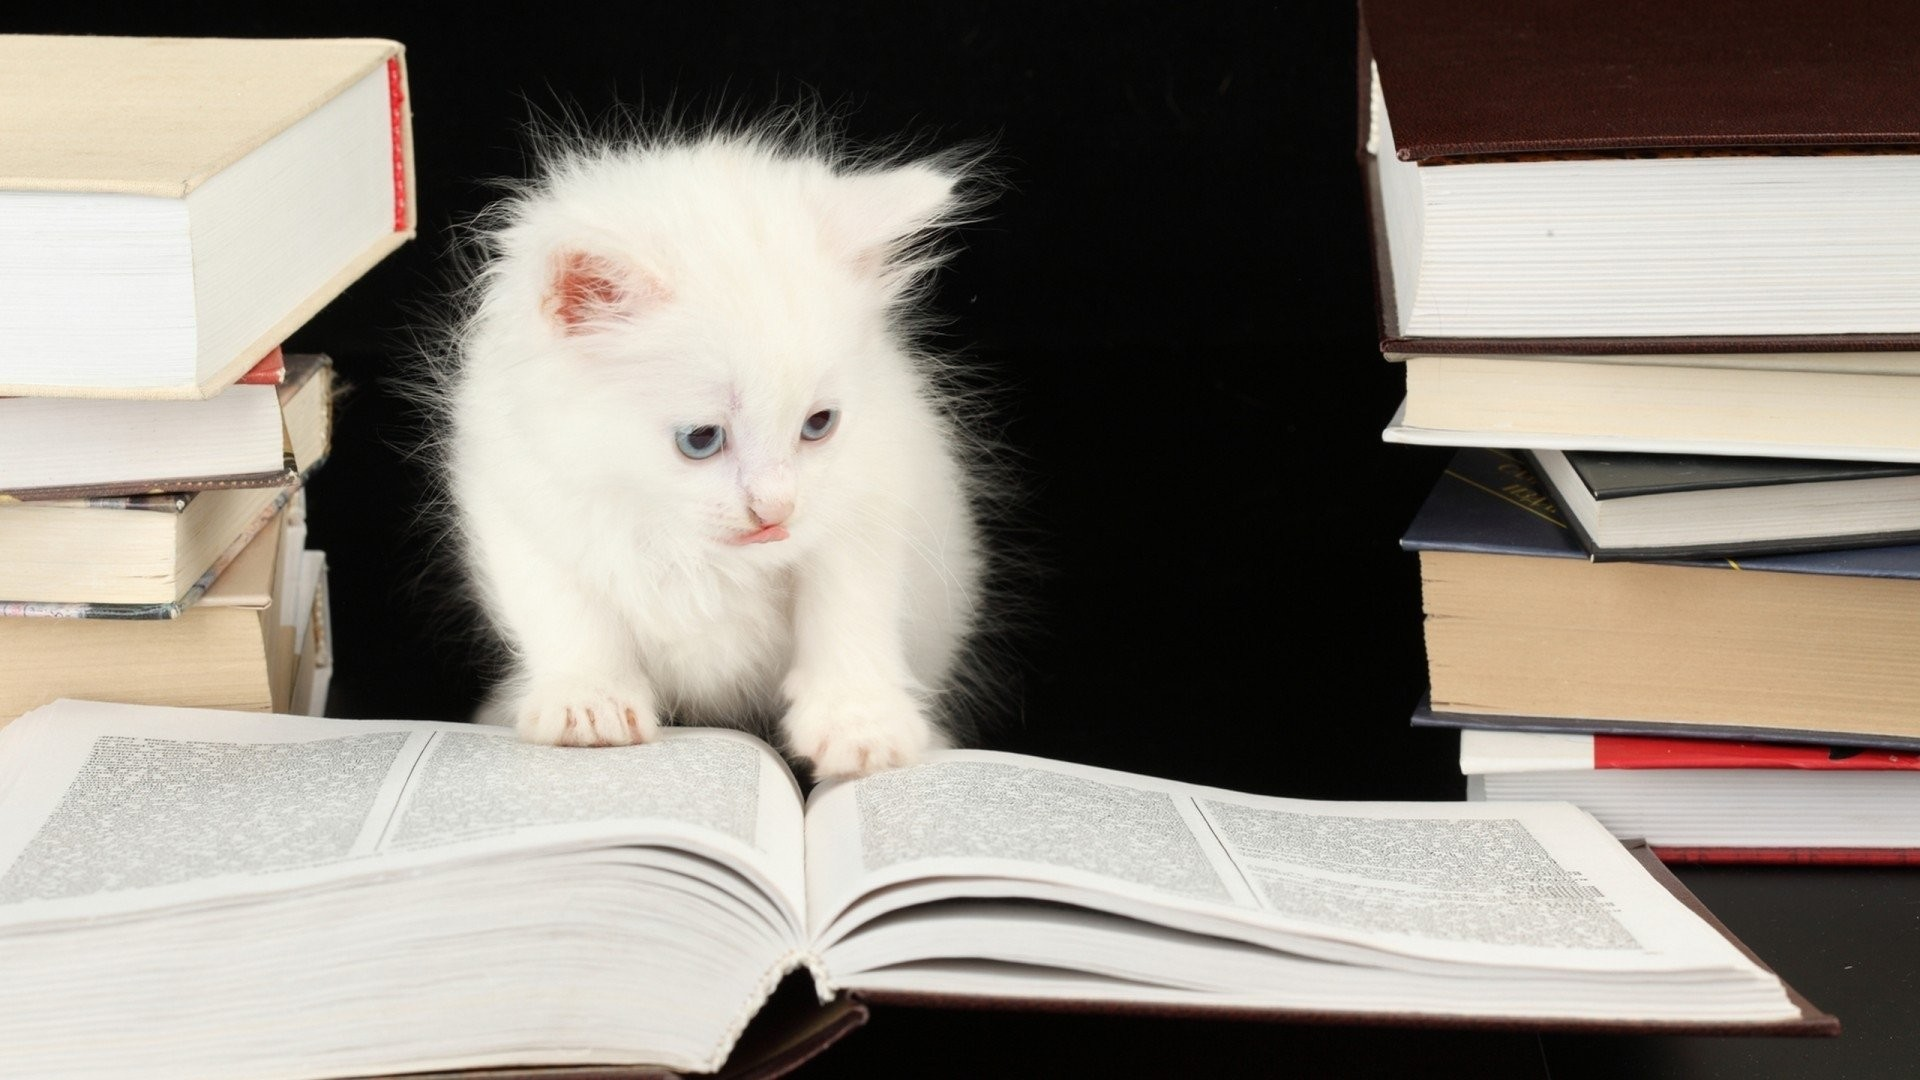 Best images about Kitten wallpaper on Pinterest Cats Sweet